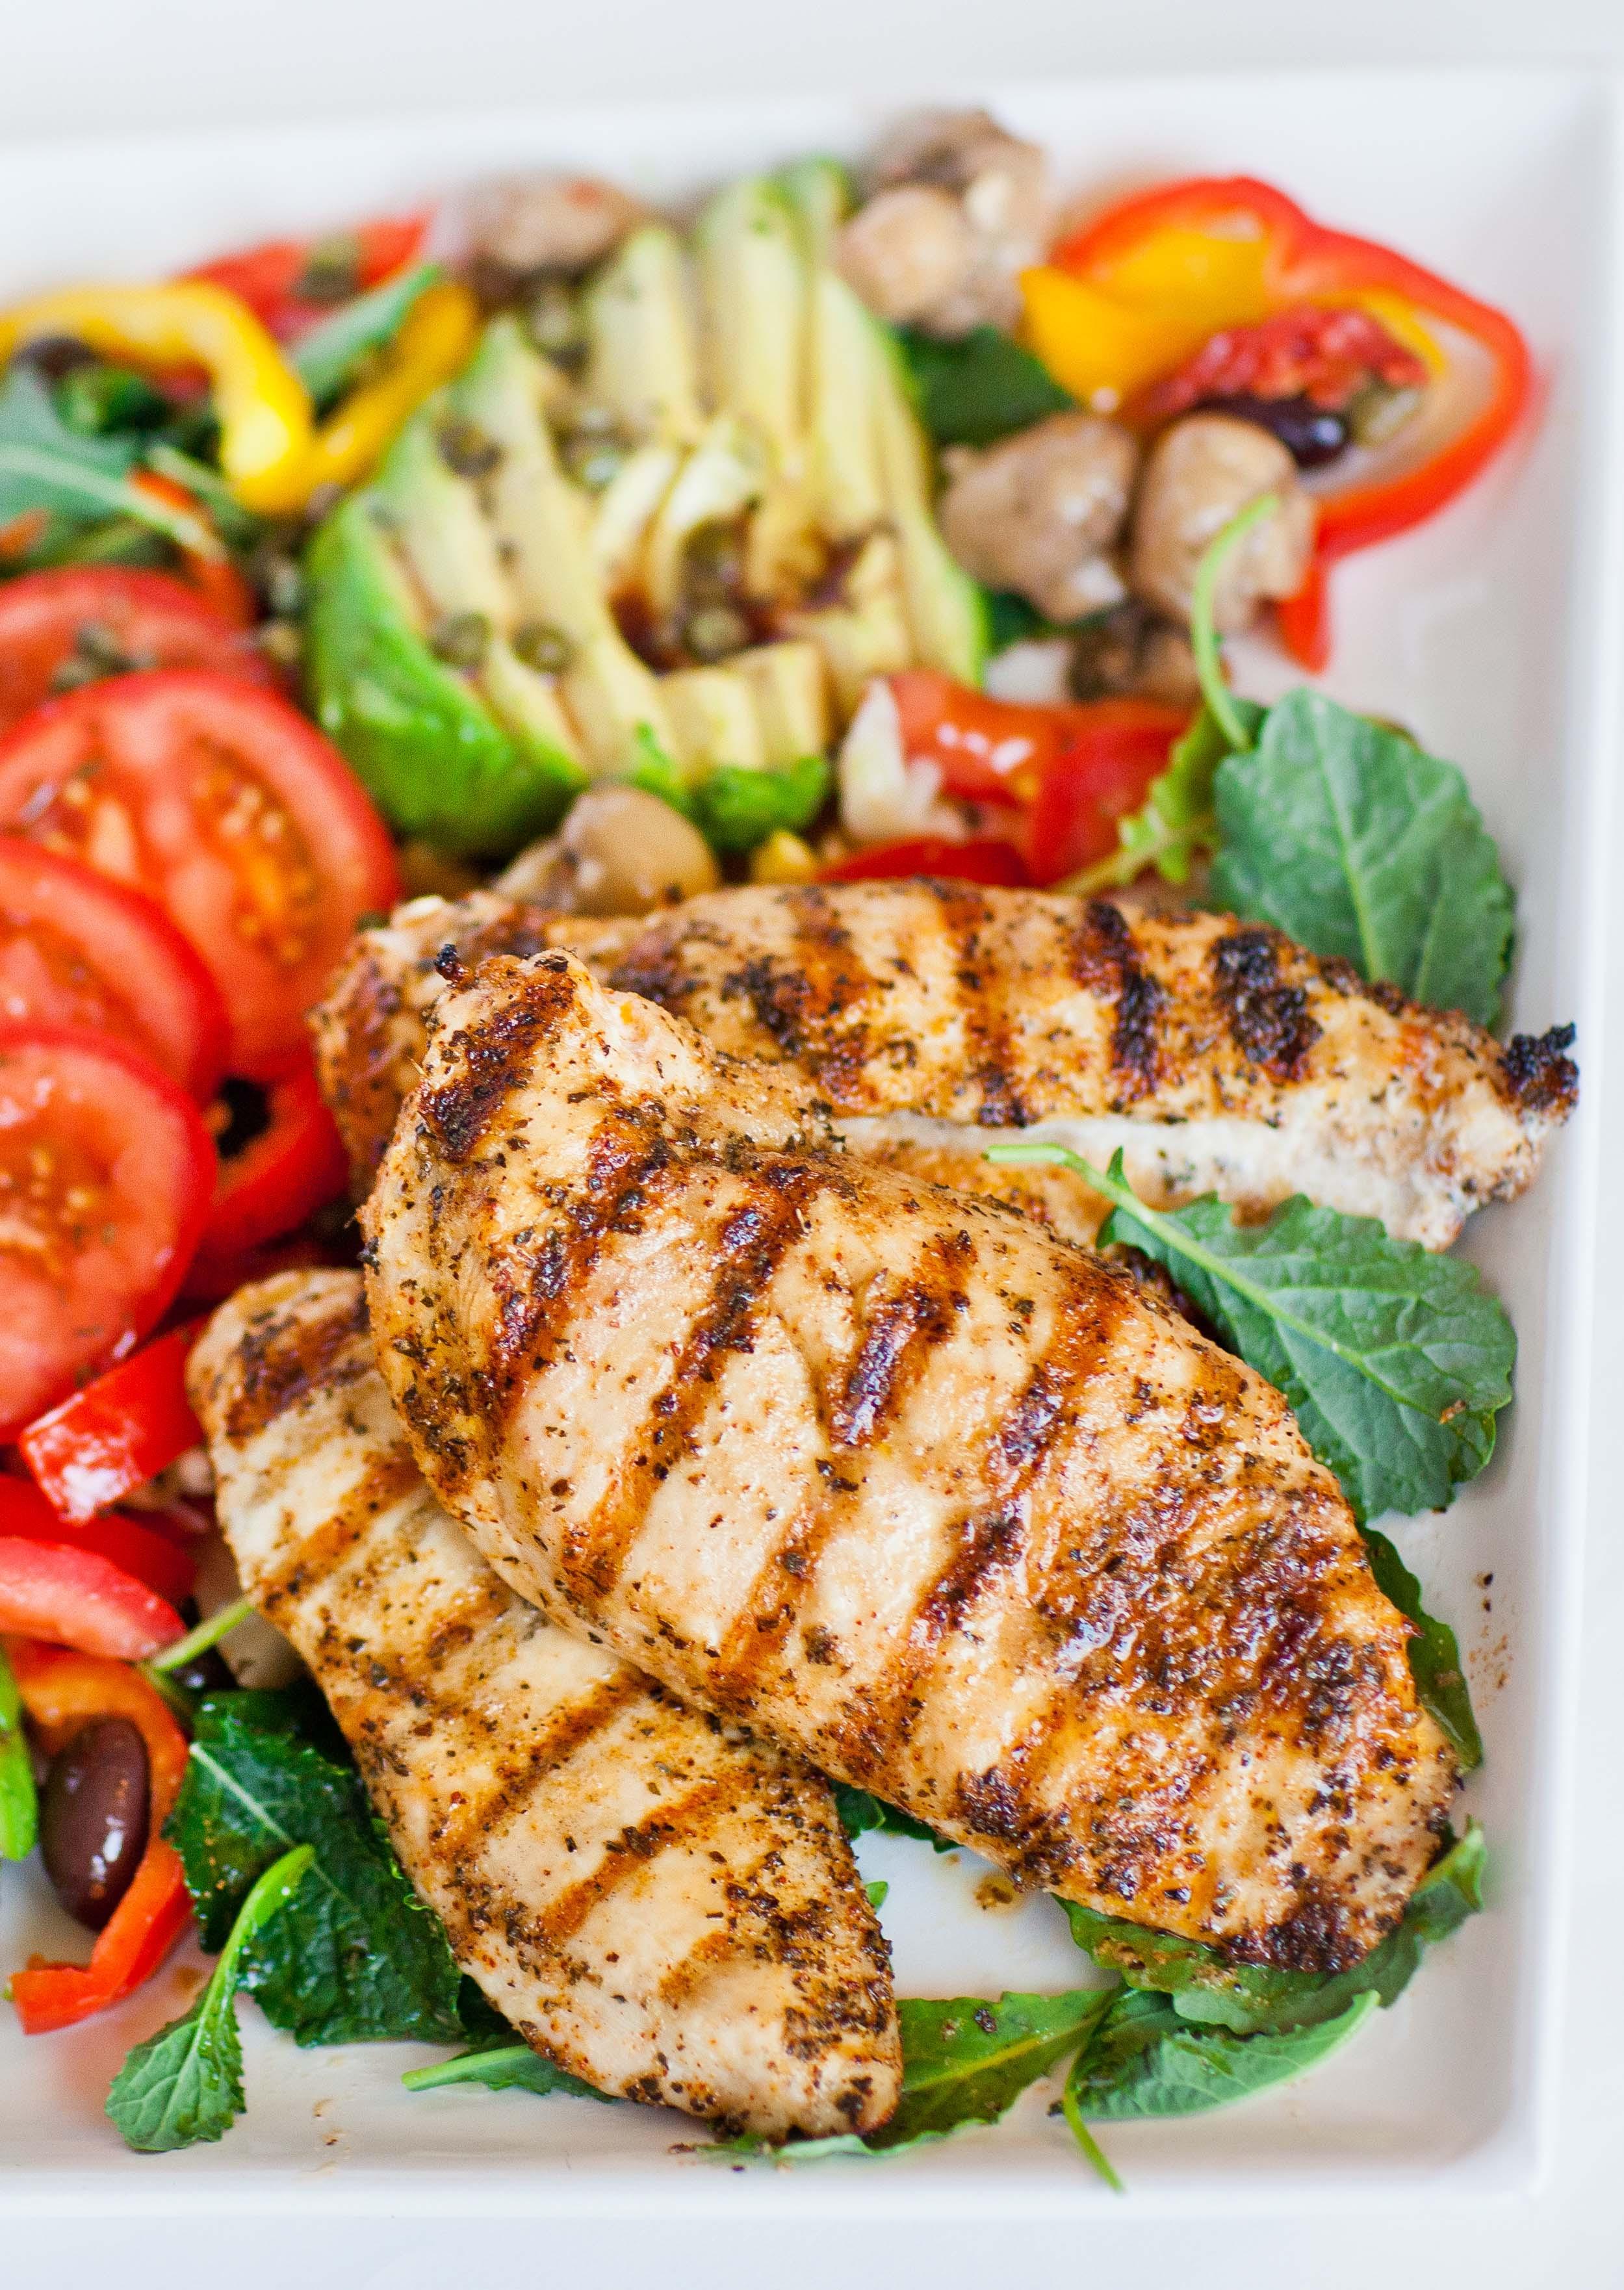 Grilled Chicken Salad Recipes  Grilled Chicken Mediterranean Salad Tatyanas Everyday Food